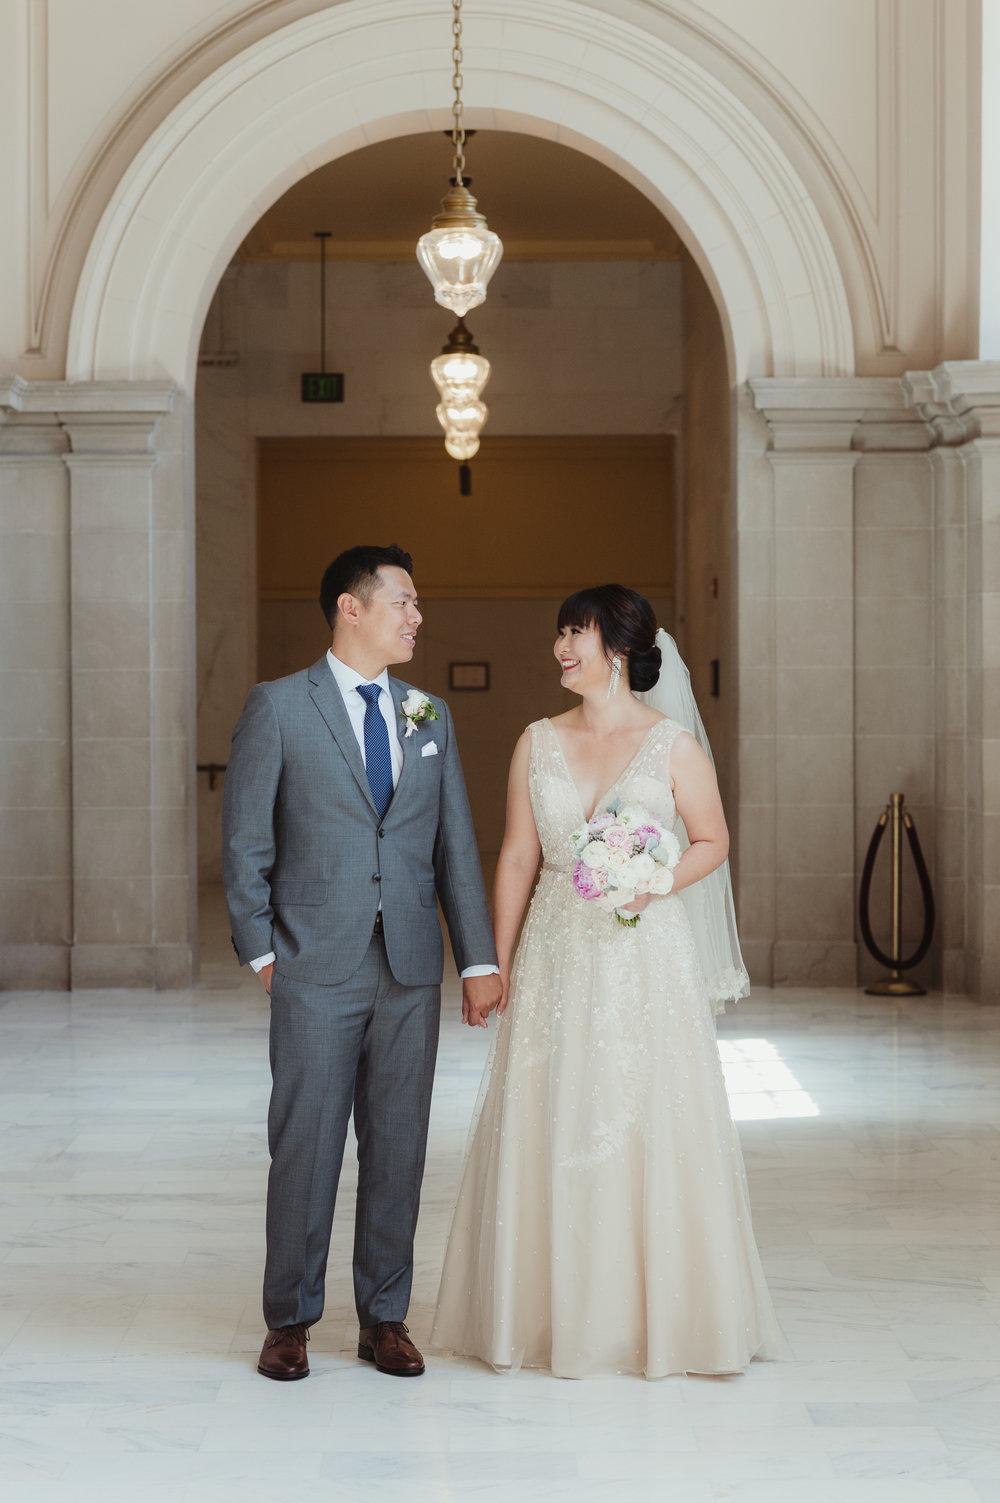 33-san-francisco-city-hall-elopement-photographer-vc.jpg